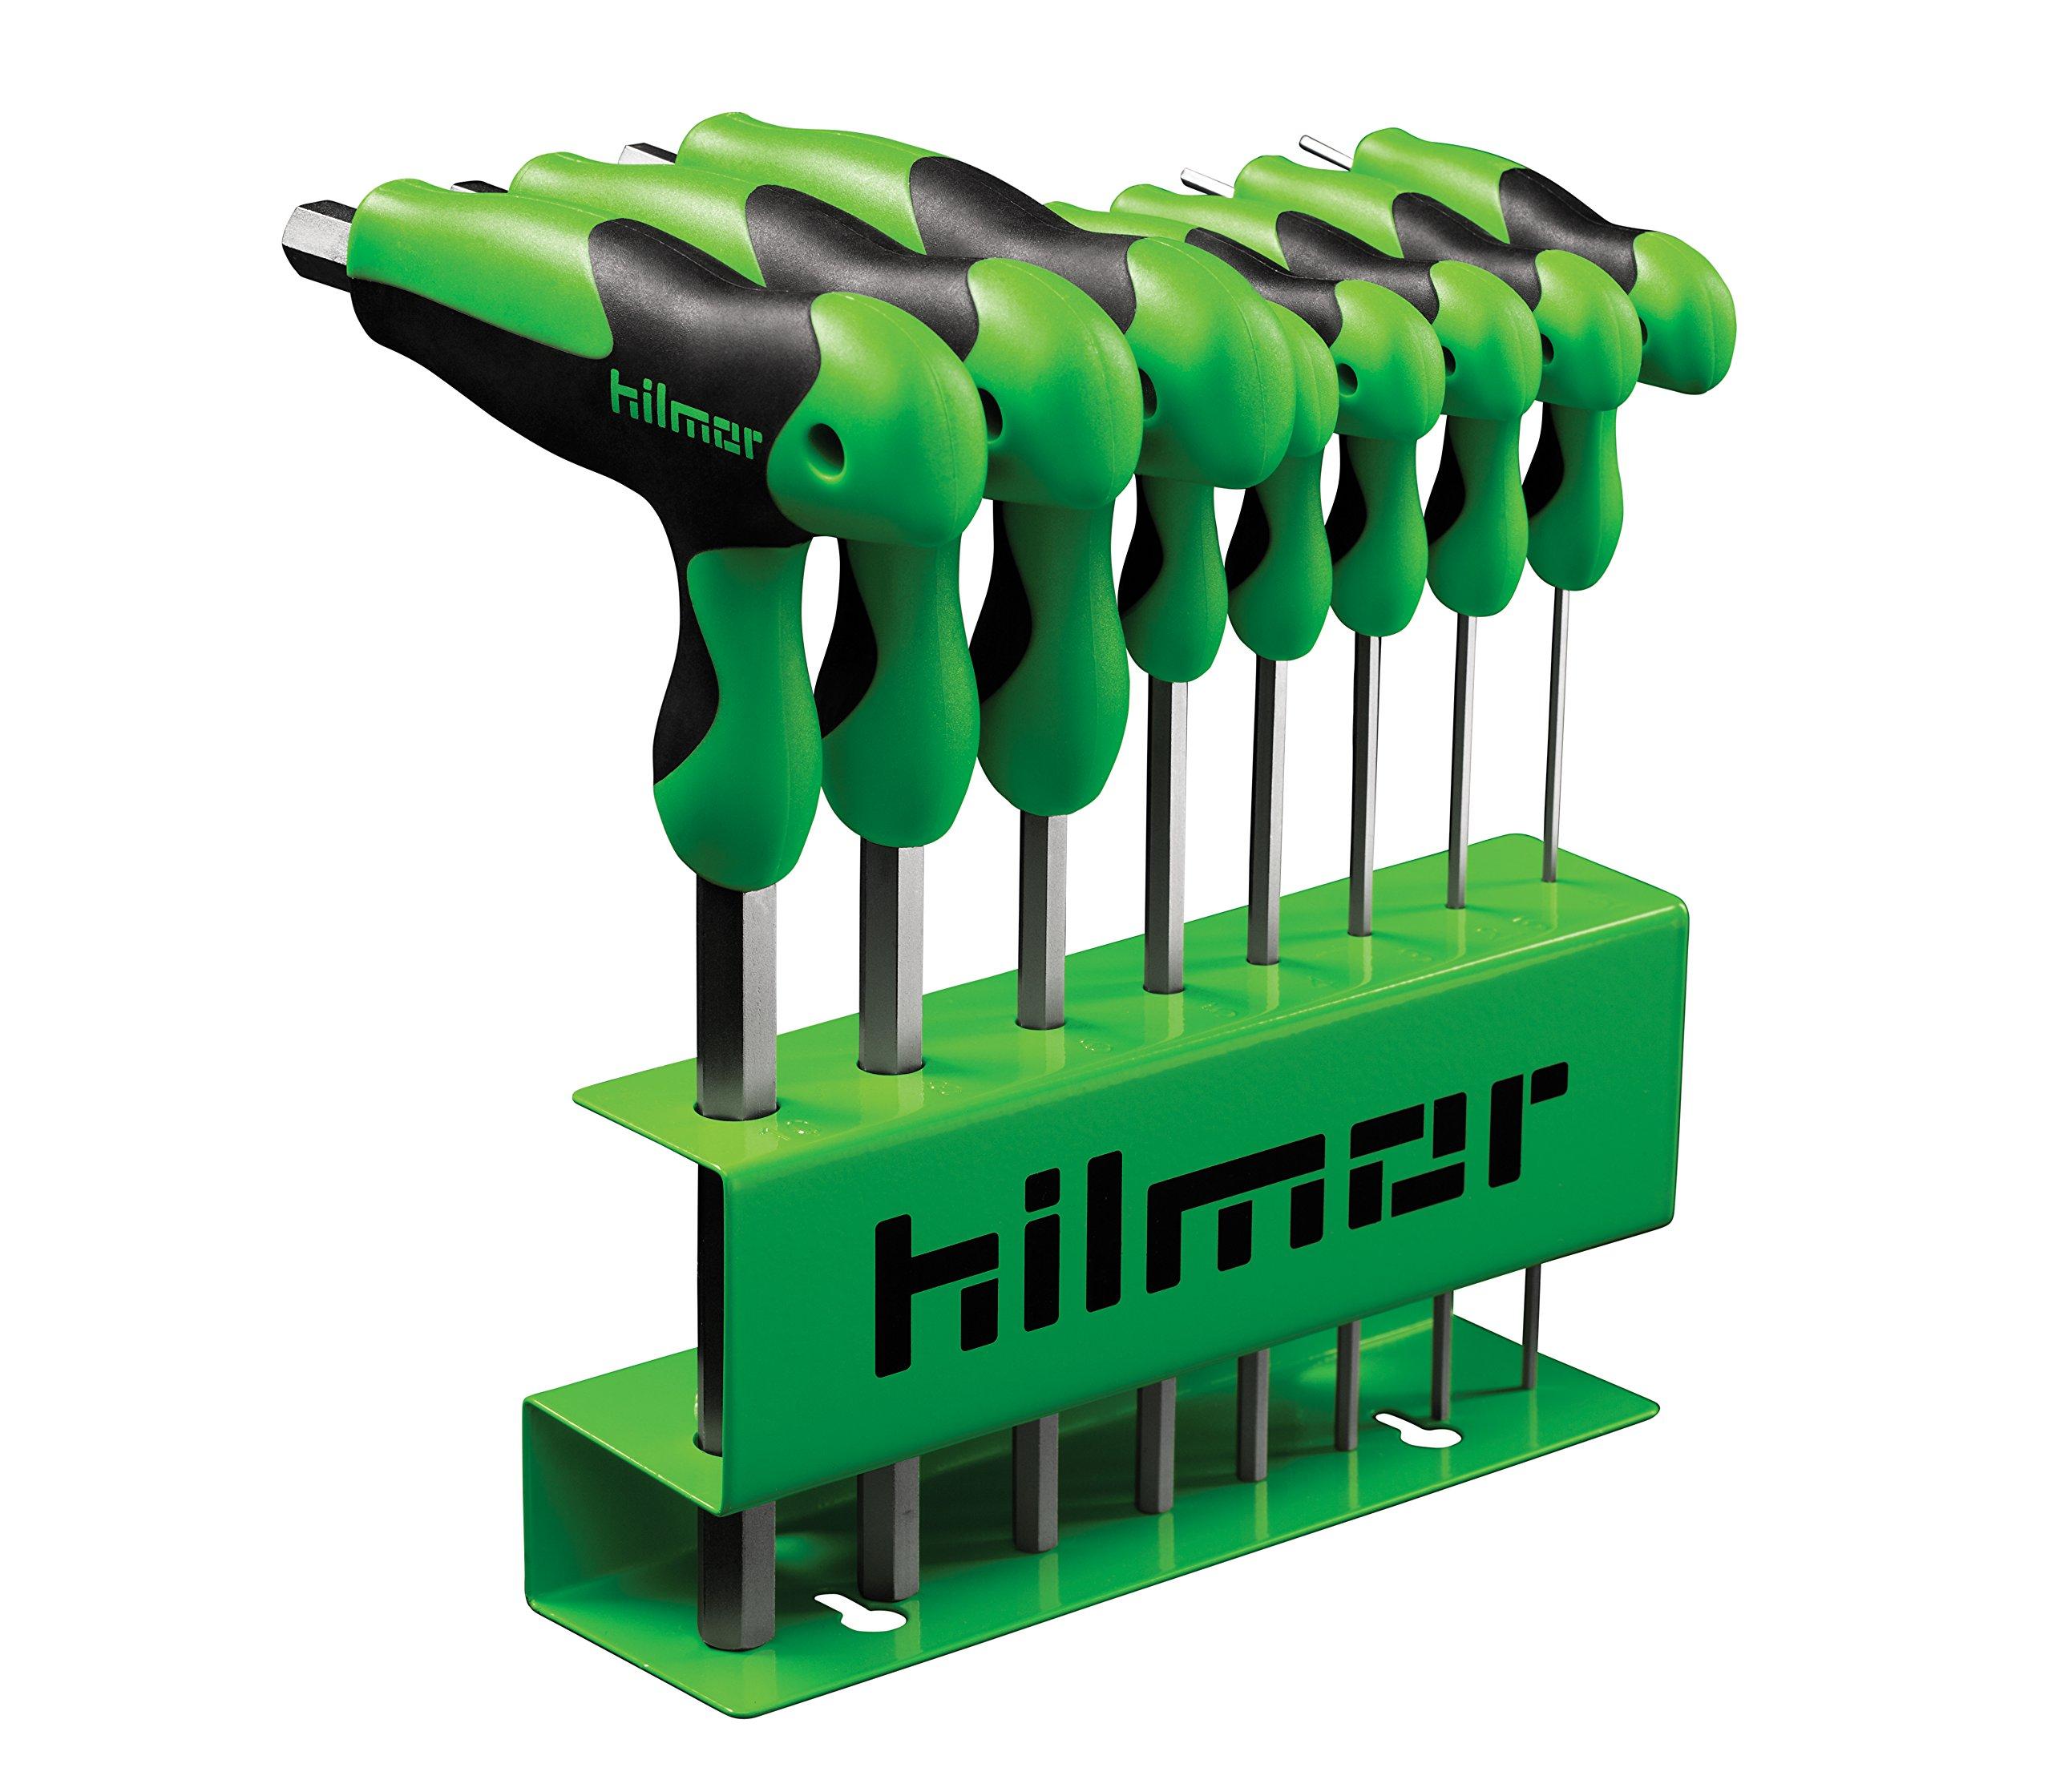 Hilmor 1937817 T-Handle Hex Key Set